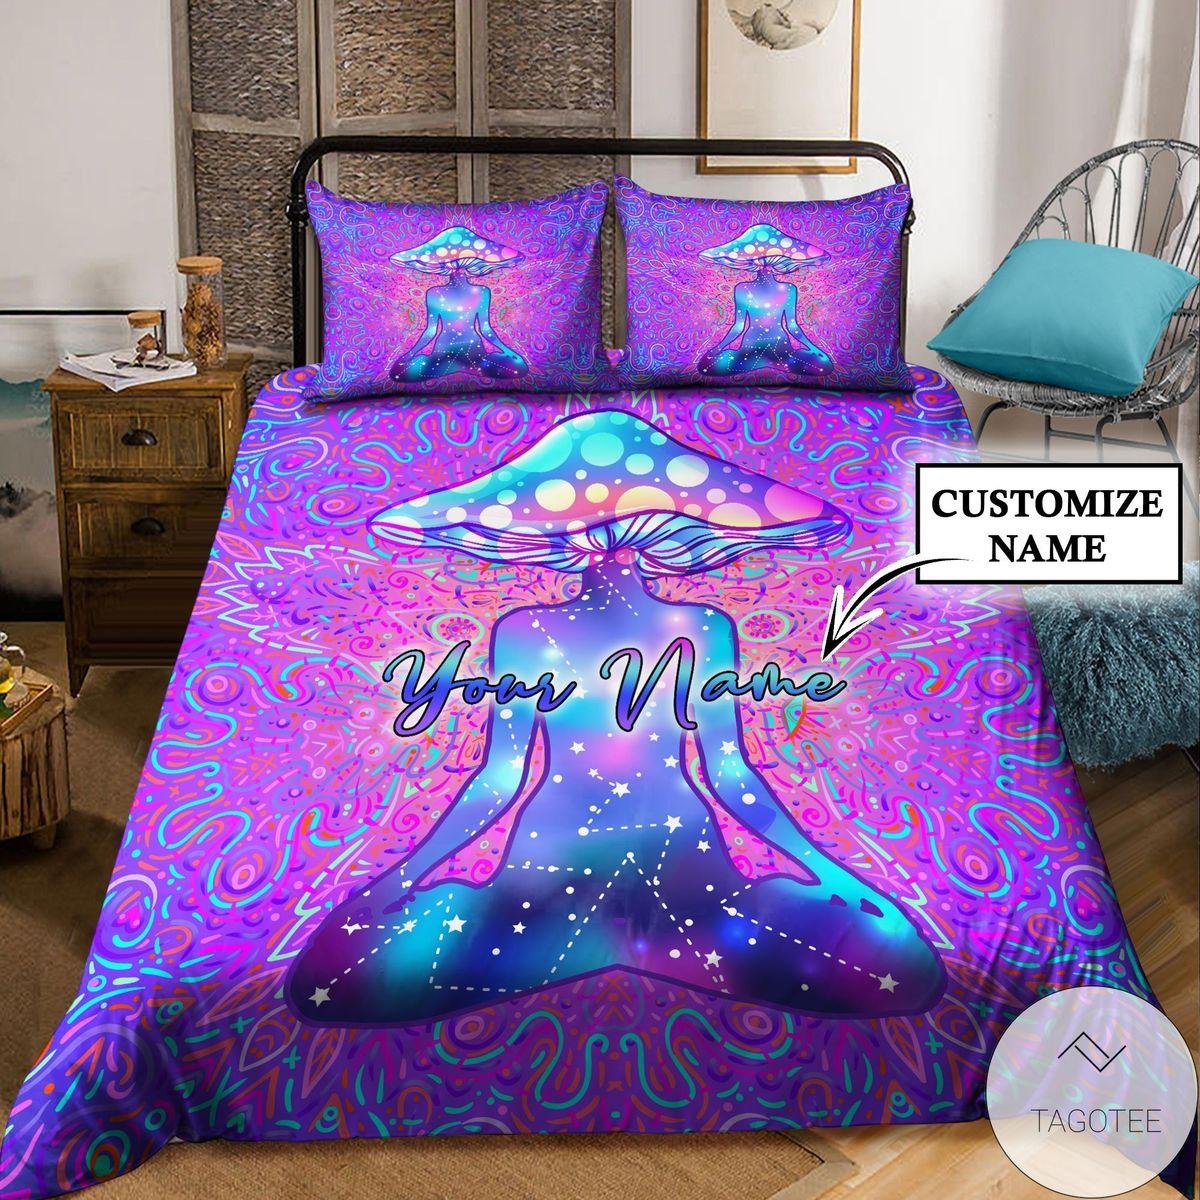 Customize Name Mushroom Hippie Bedding Setc